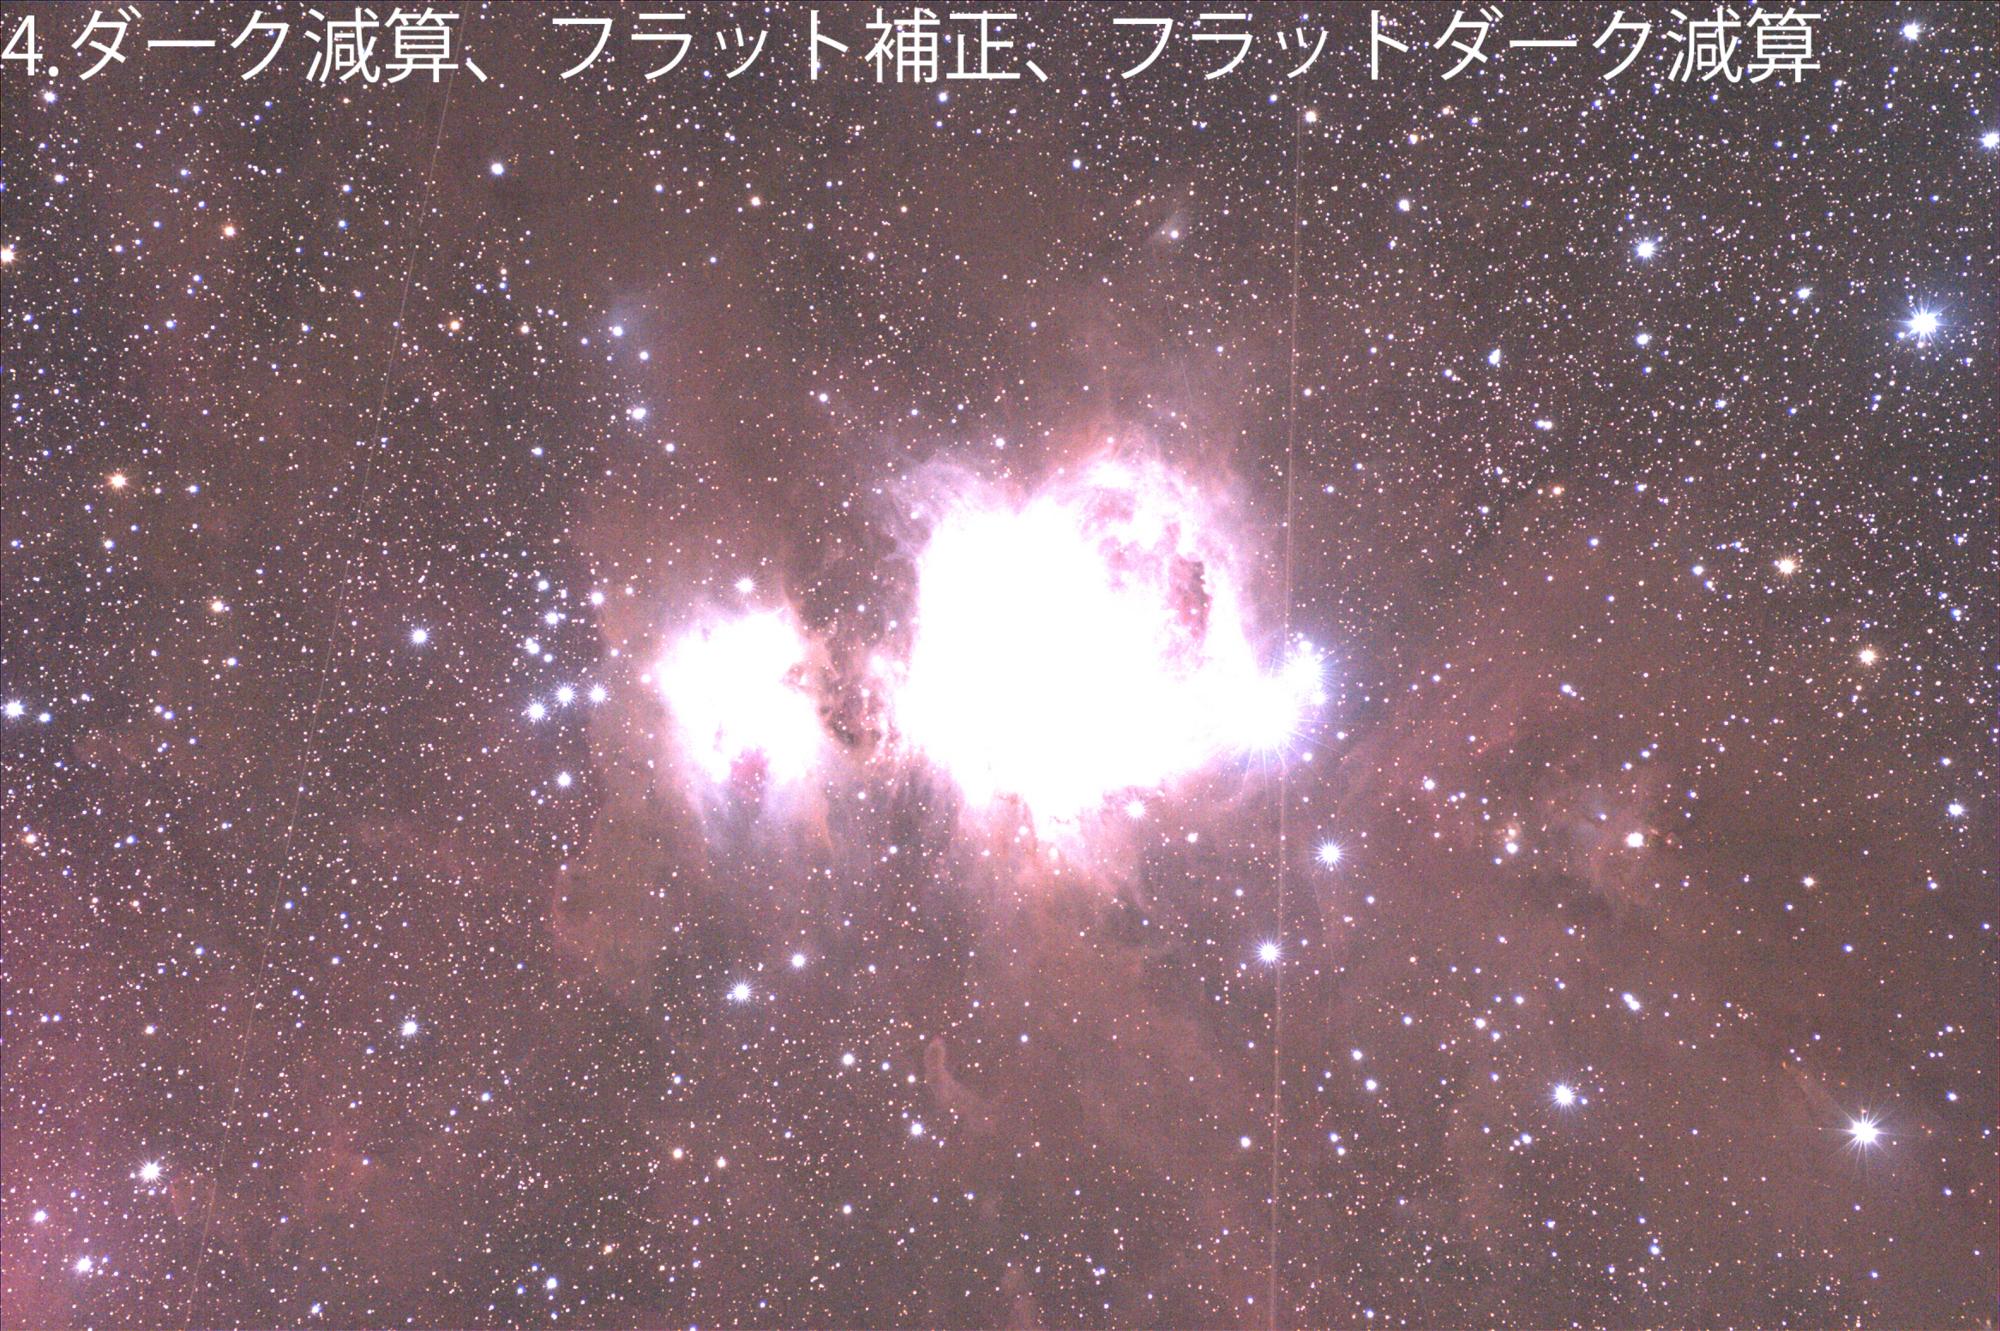 f:id:snct-astro:20171210224953j:plain